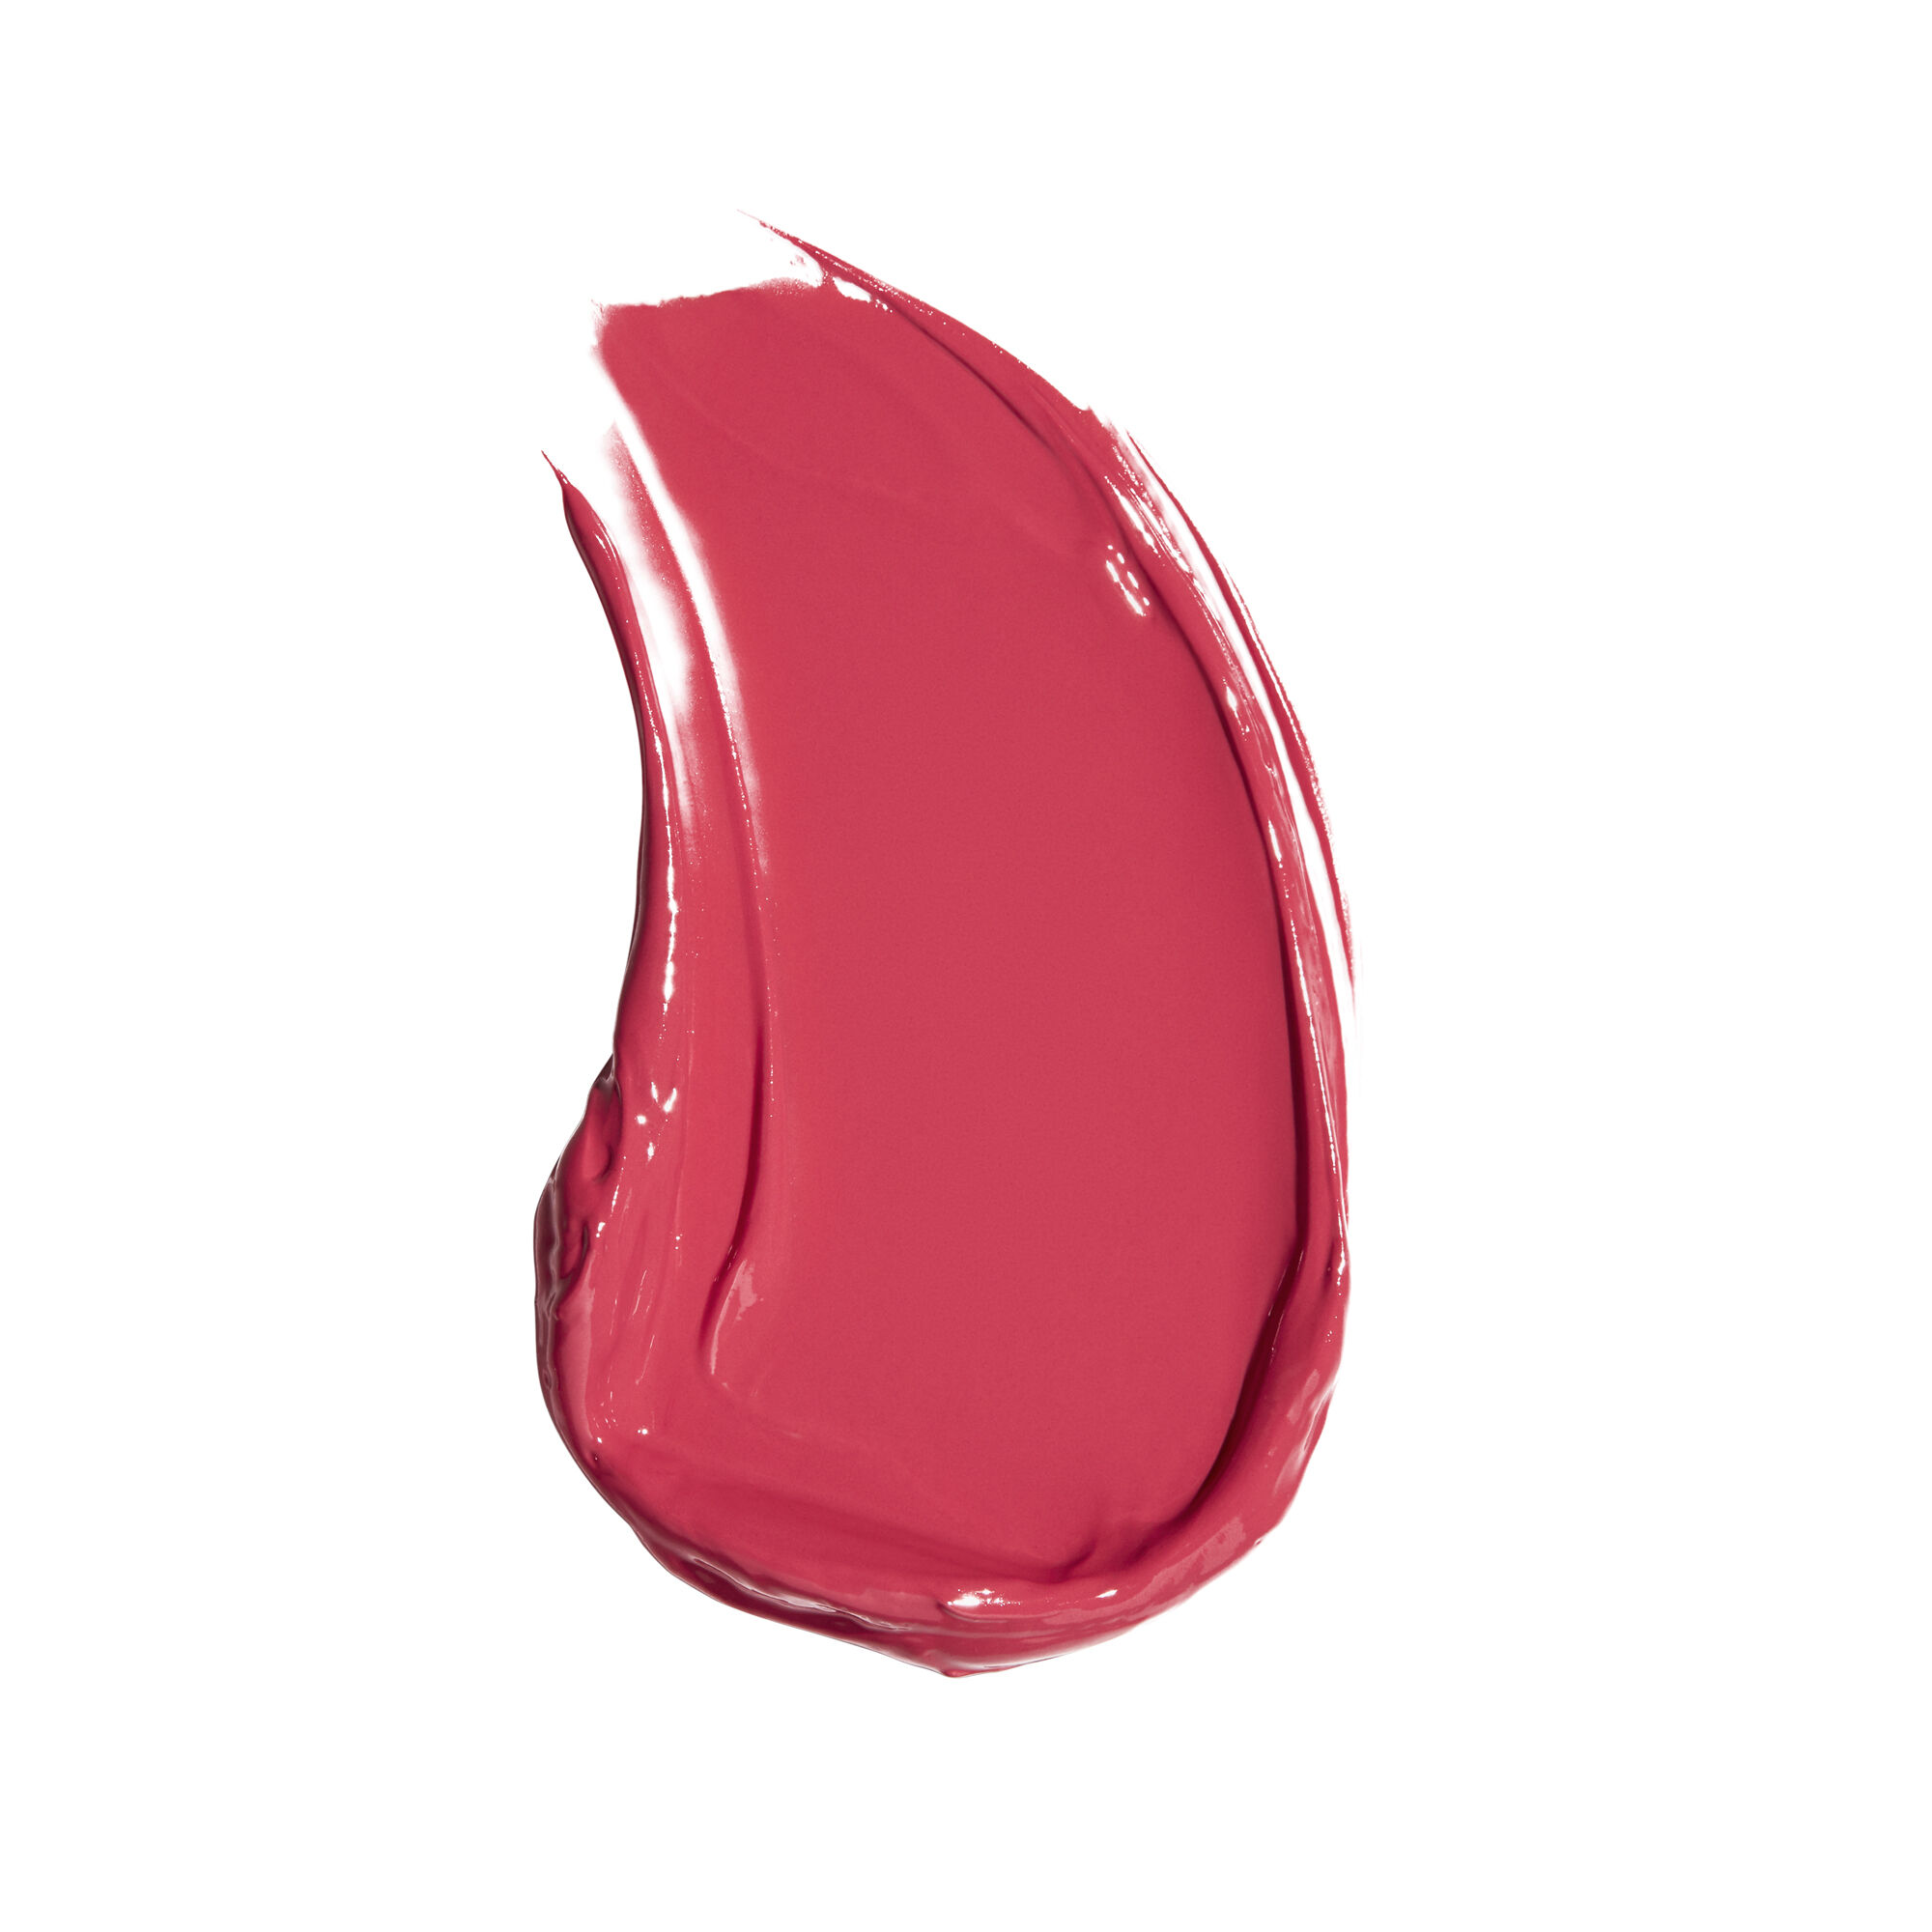 Liquid Lipstick, Goddess